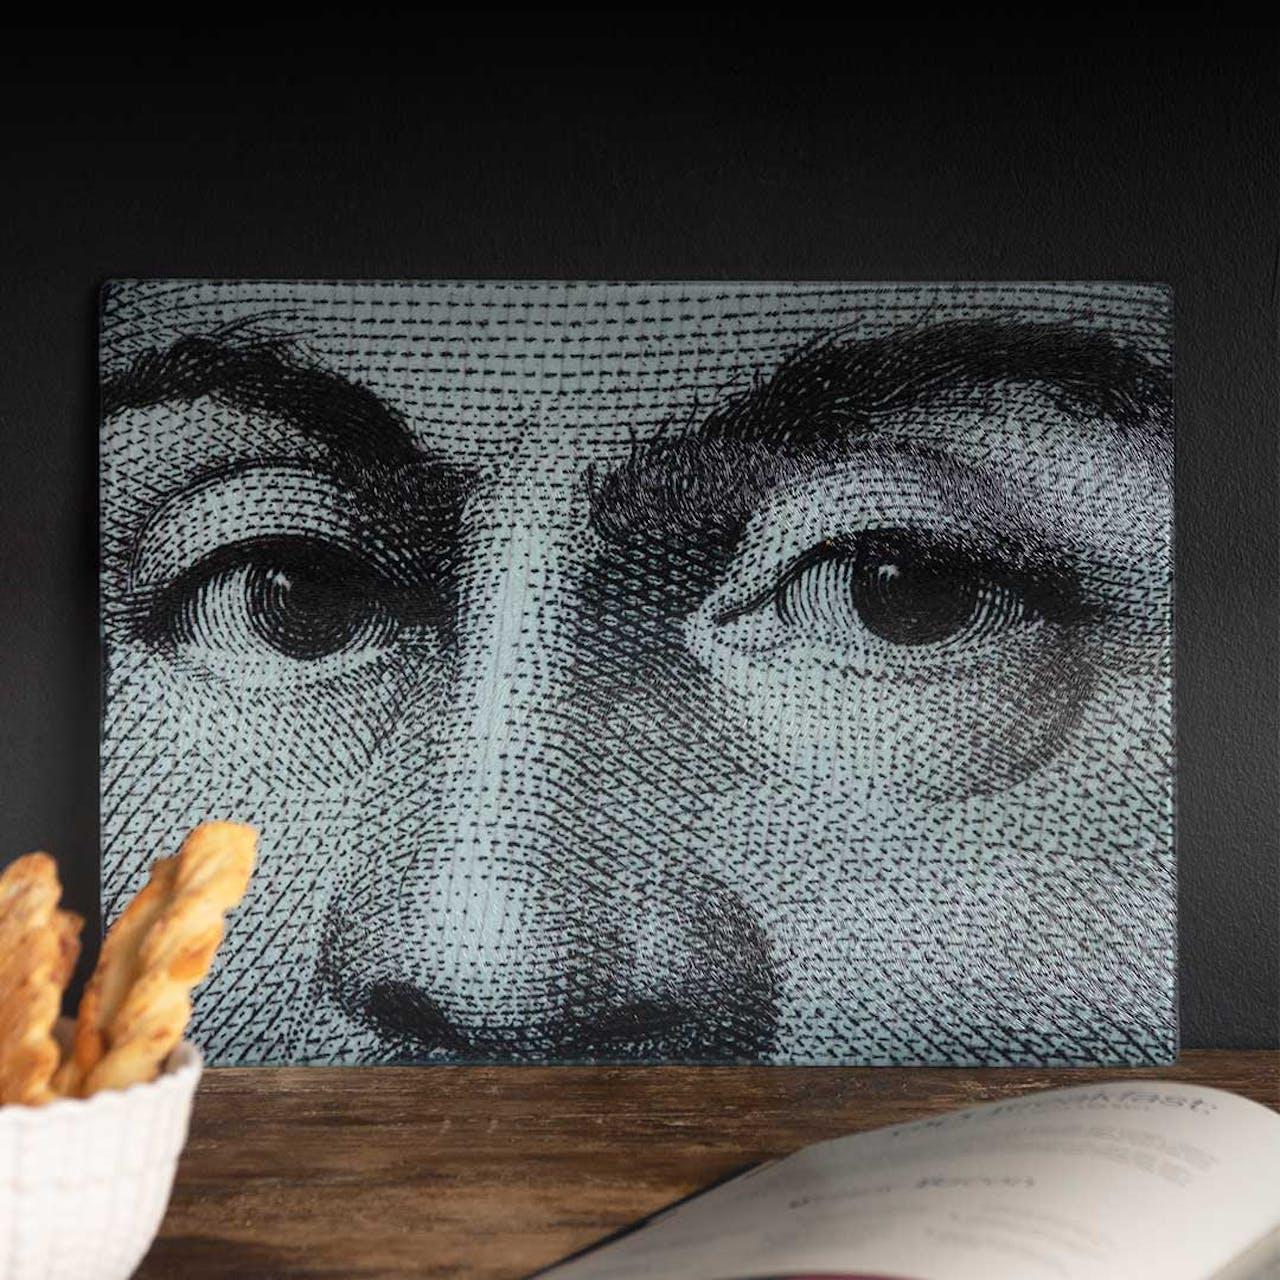 Face close up chopping board